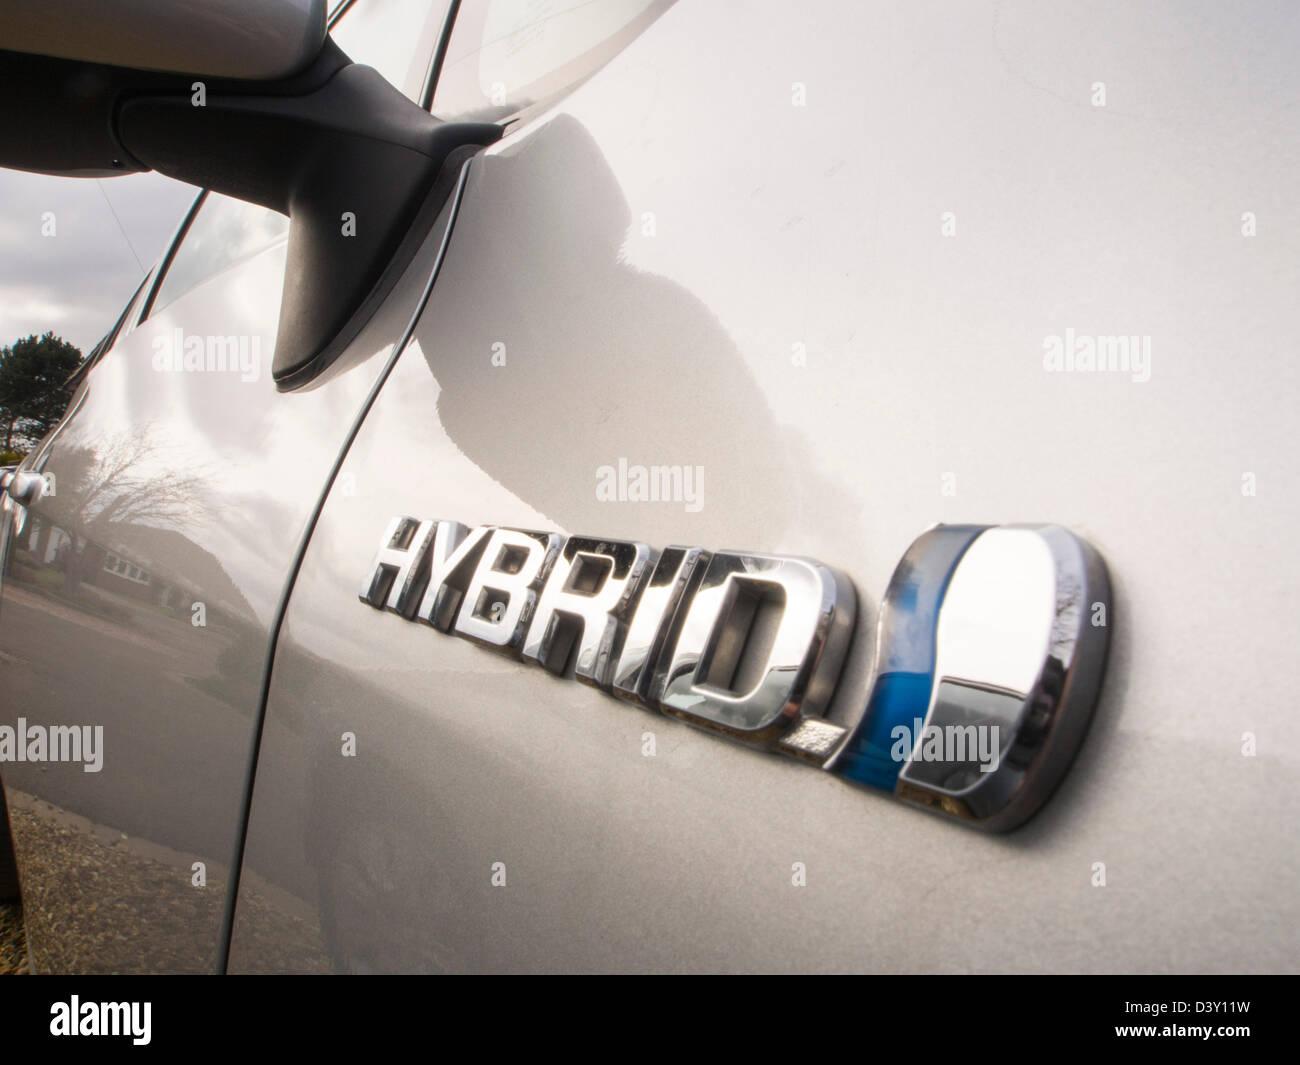 Un Aura de Toyota Hybrid Synergy Drive un coche. Imagen De Stock